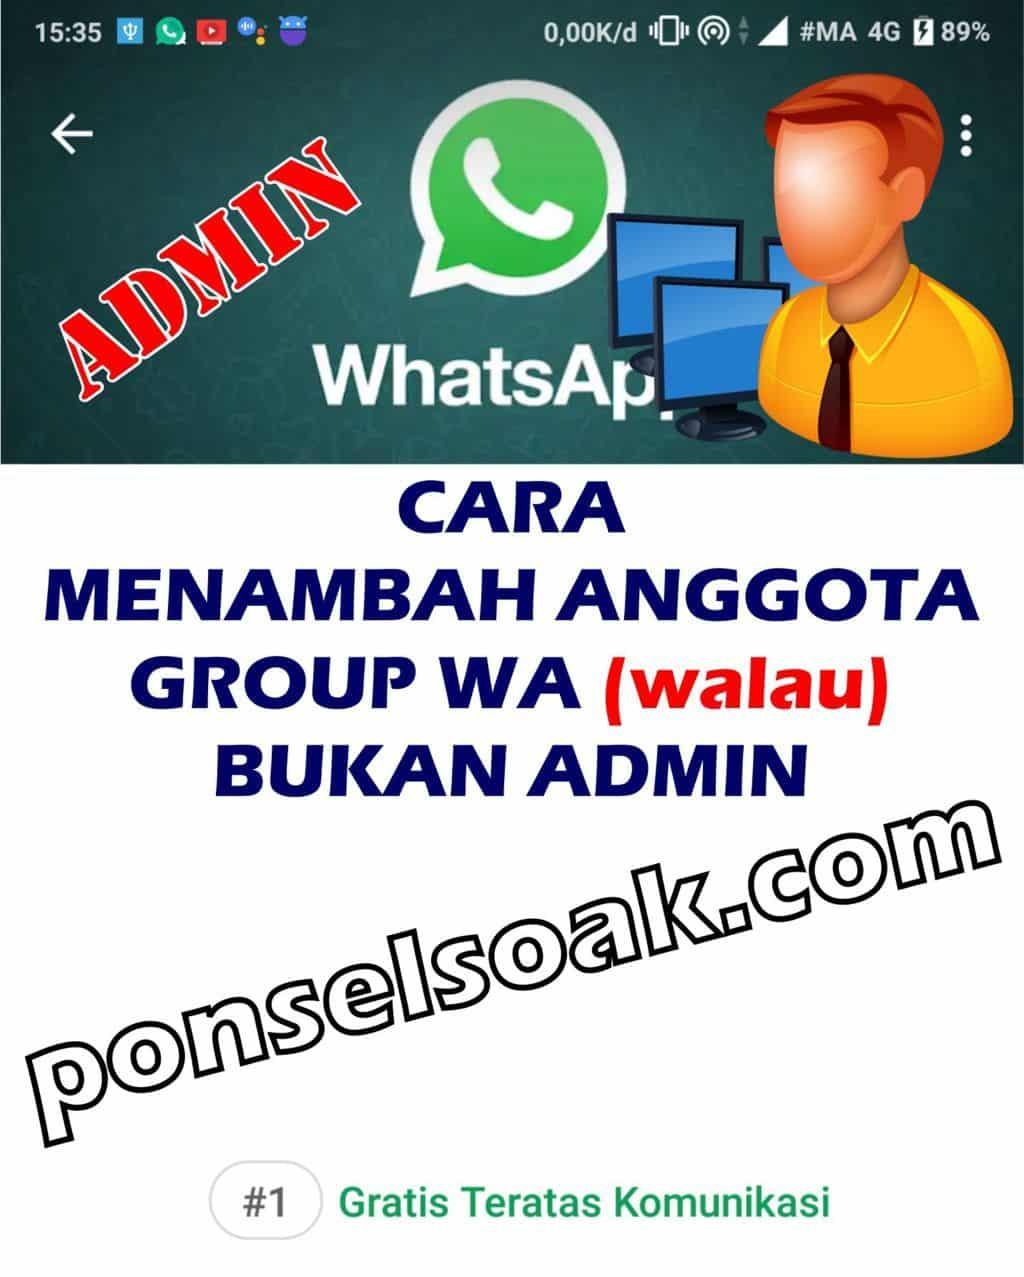 Cara Menambahkan Anggota Grup WhatsApp (Walau) Bukan Admin